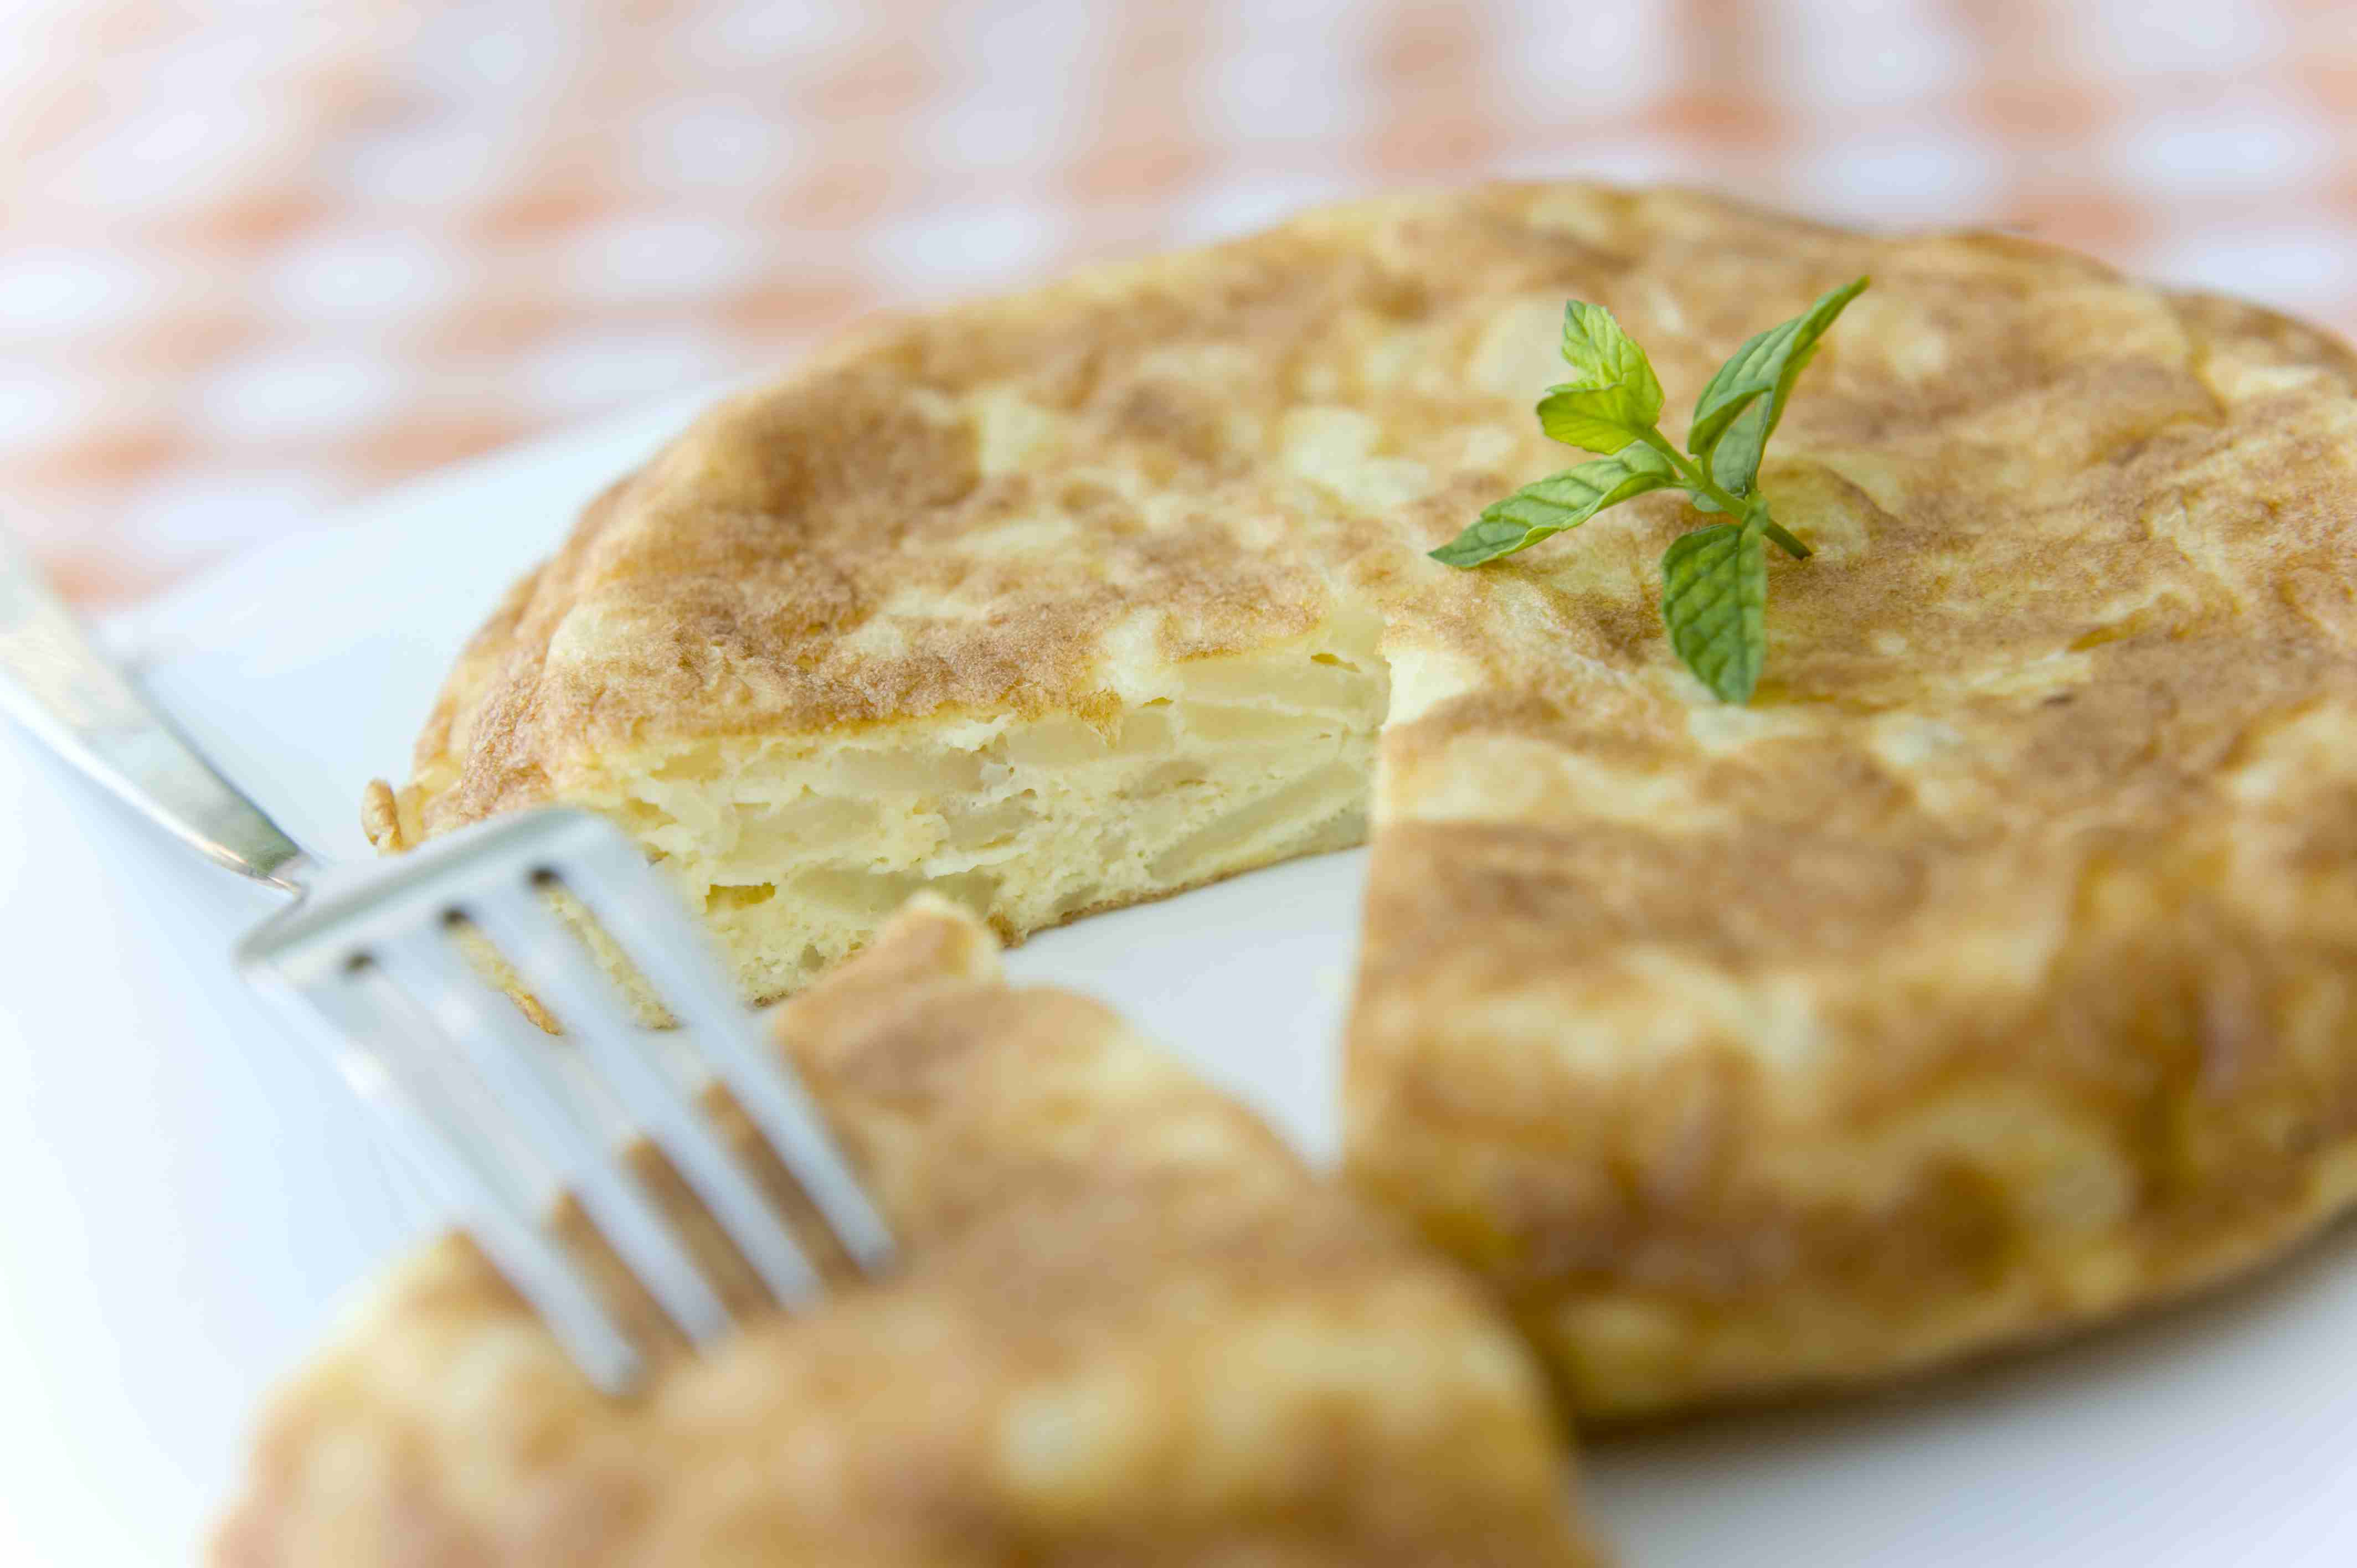 Spanish potatoe and onion omelette